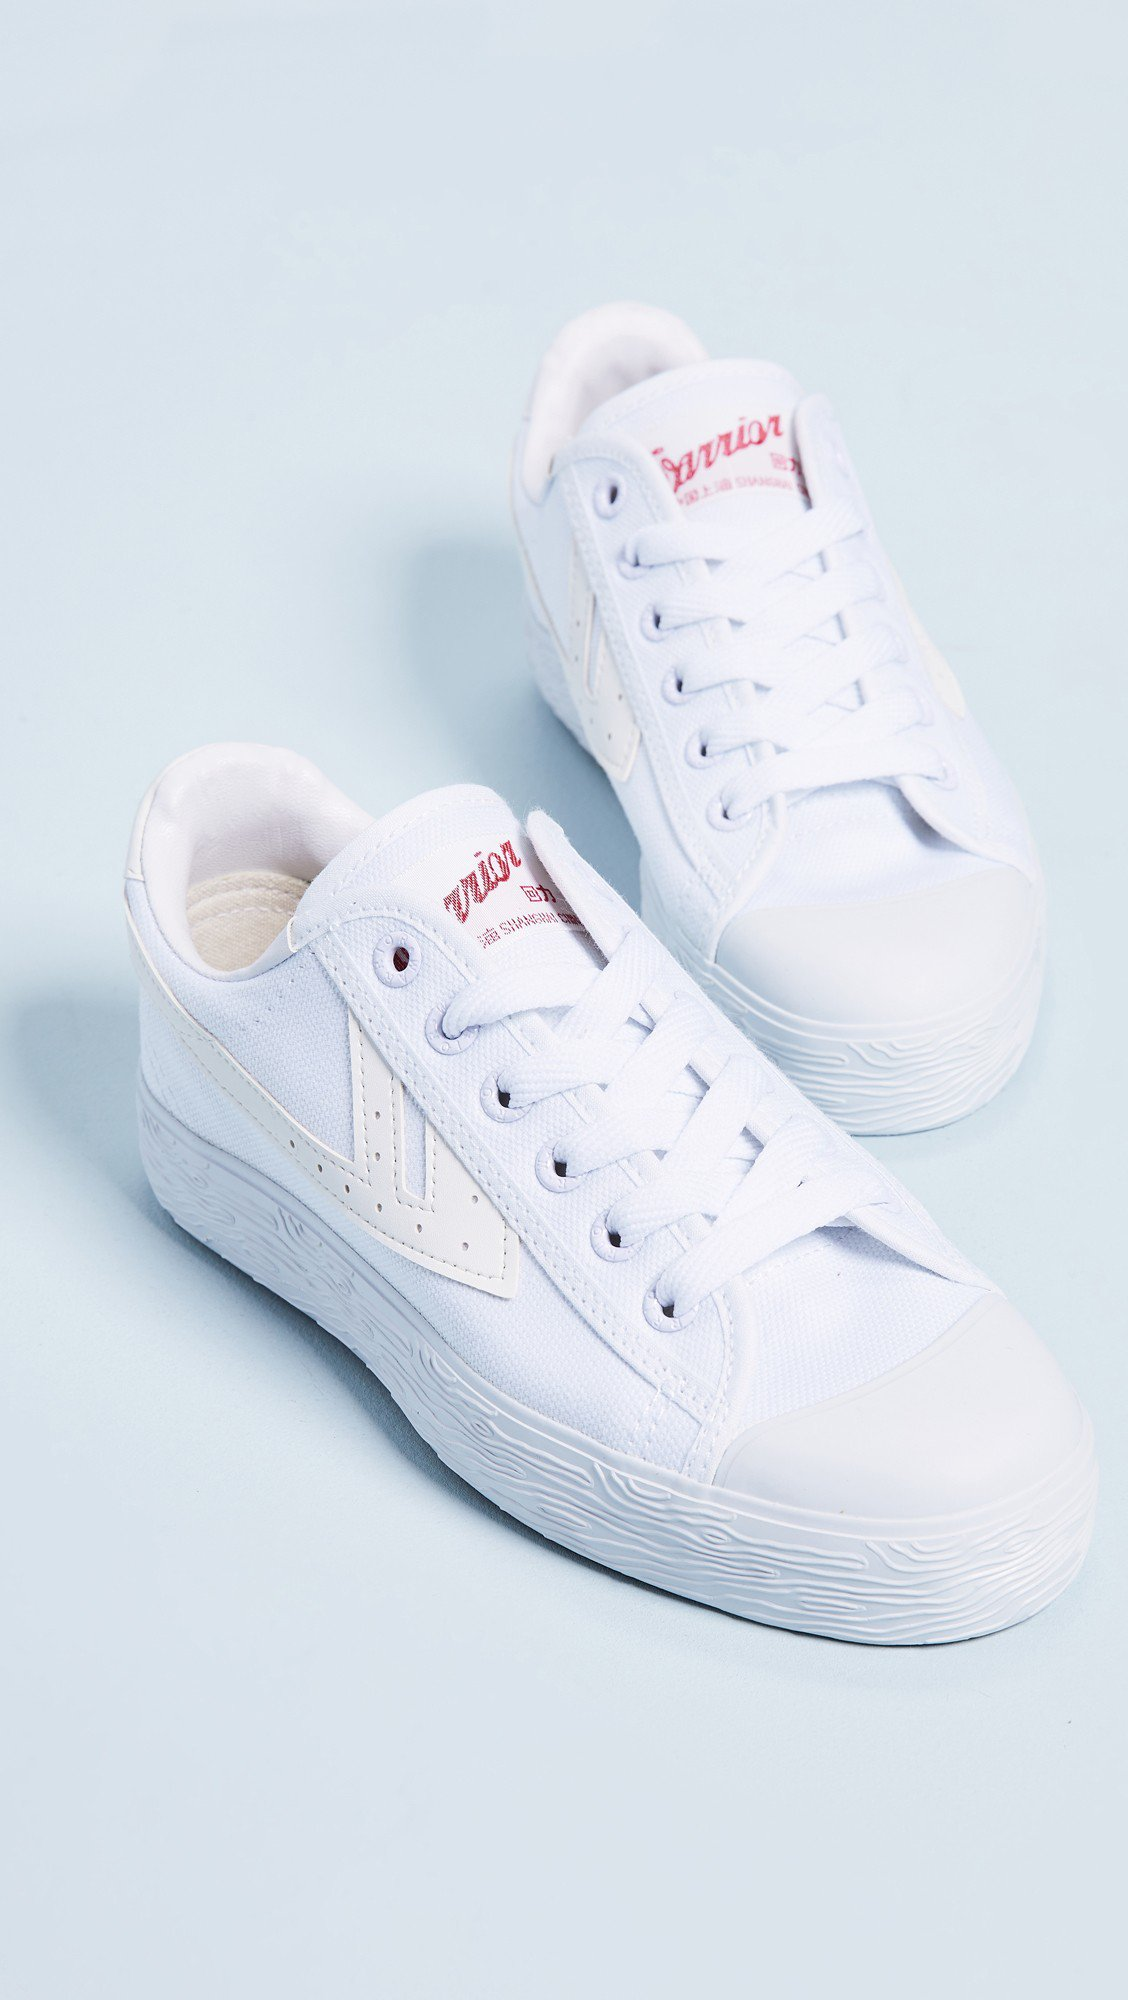 WOS33經典運動鞋,售價89美元、約合台幣2,755元。圖/SHOPBOP提供